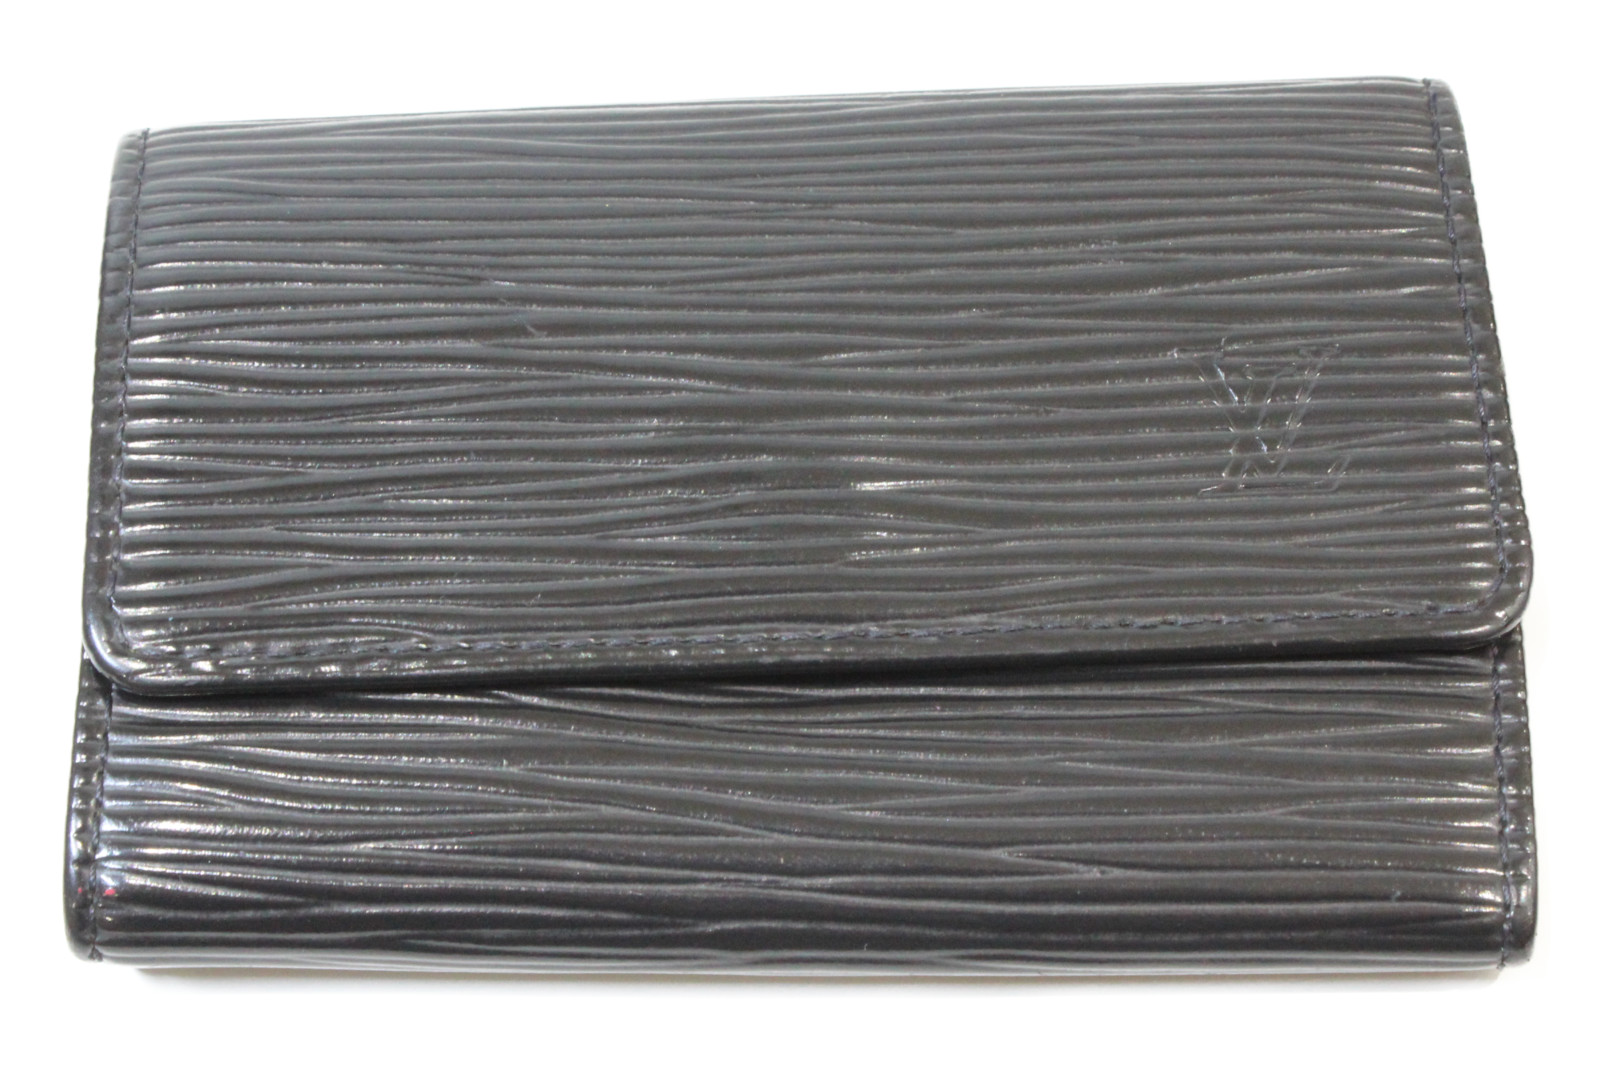 LOUIS VUITTON ルイヴィトンミュルティクレ6 M63812エピ ブラックキーケース シンプルプレゼント包装可 【中古】